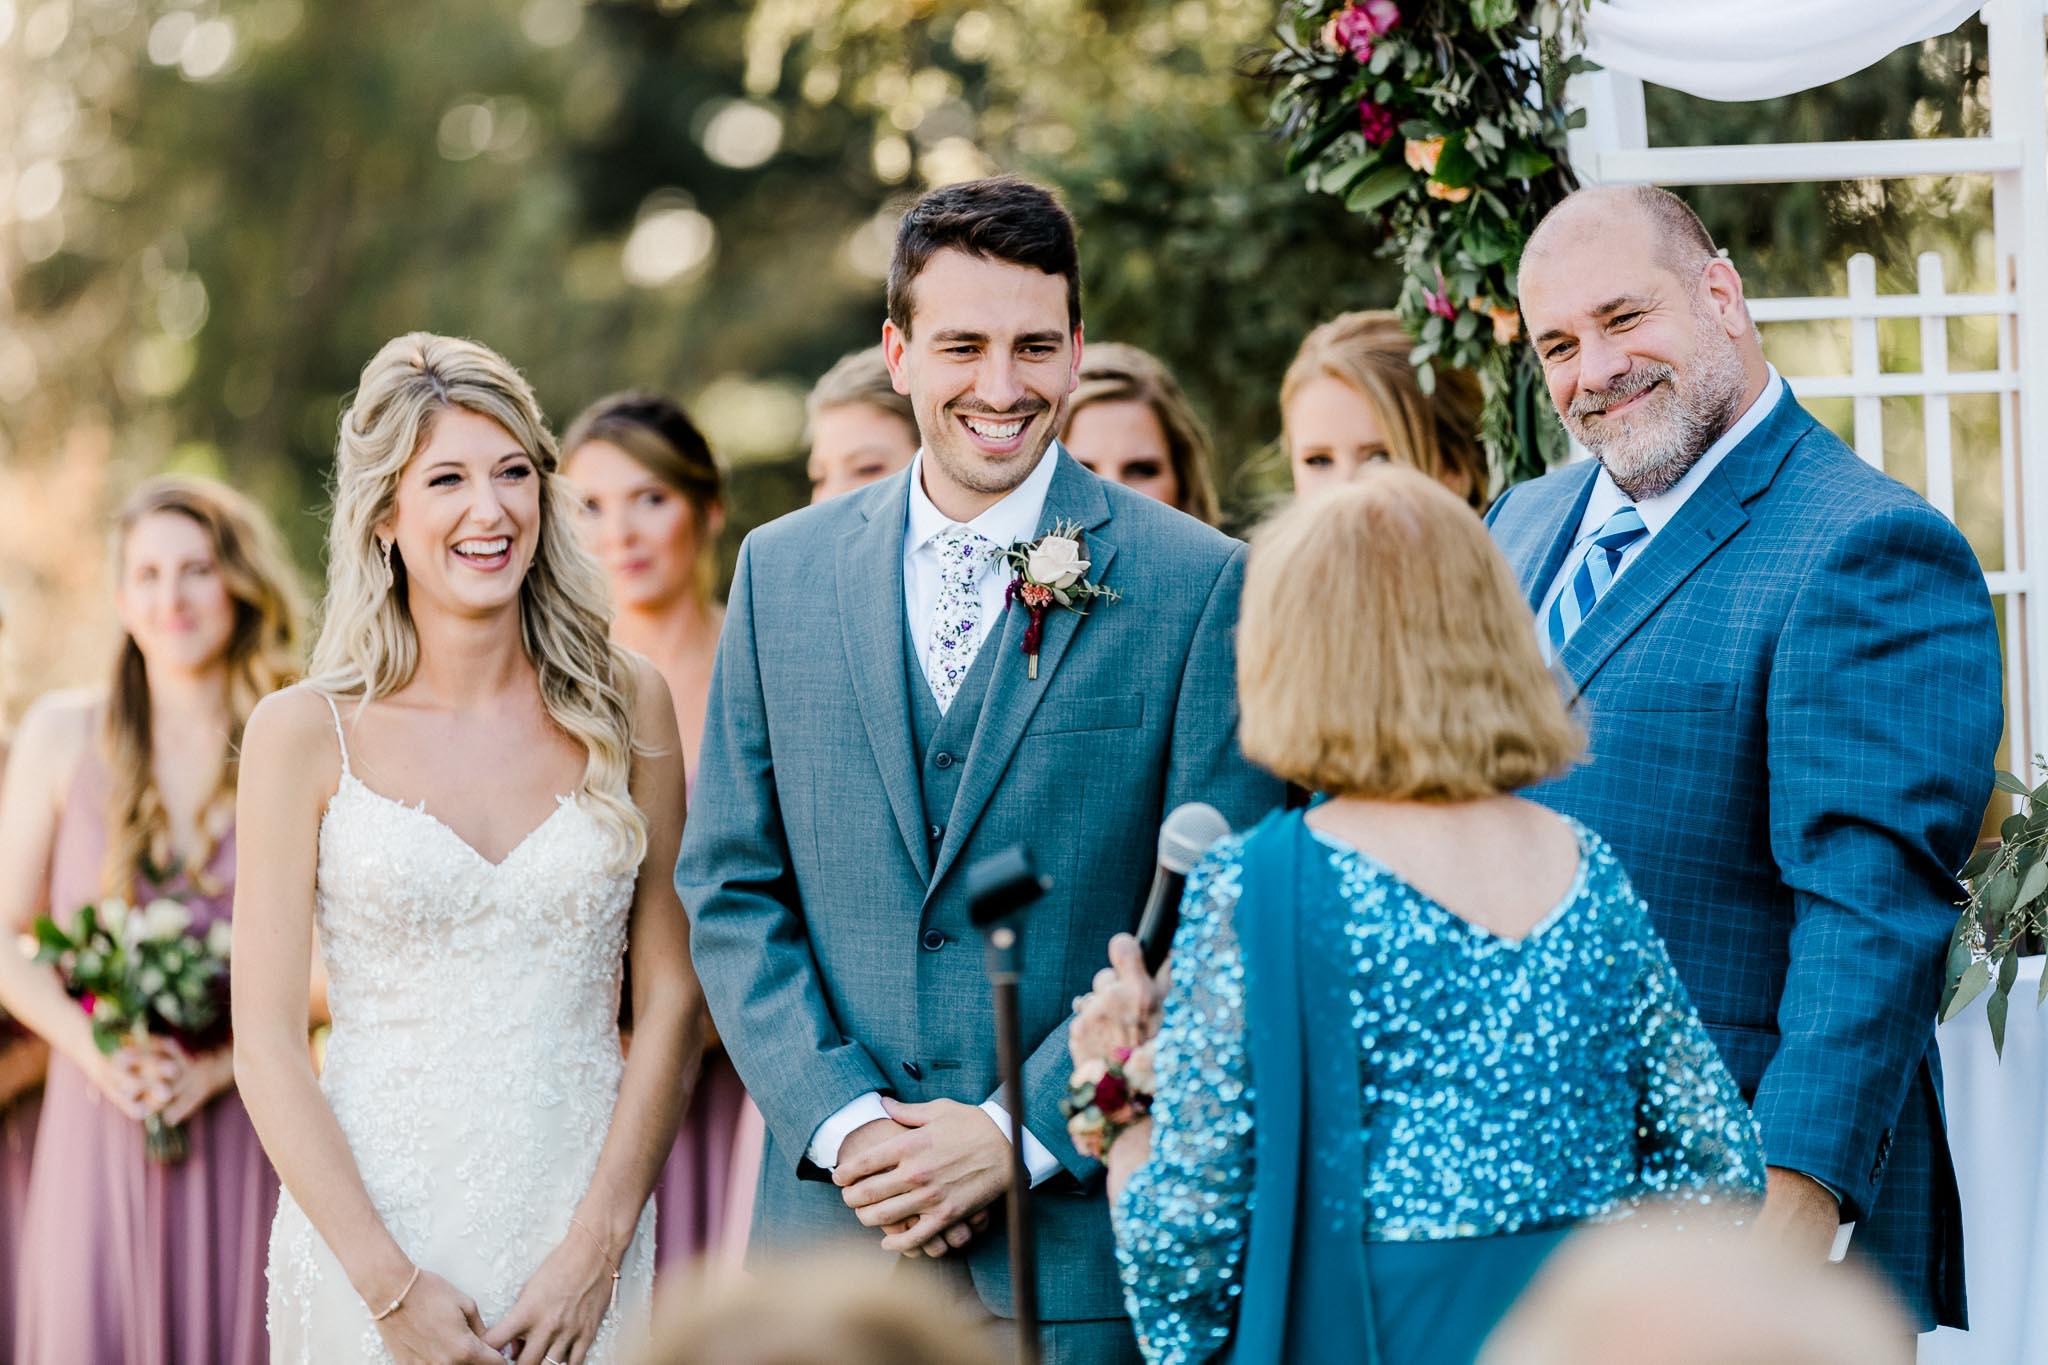 Frosty-Valley-September-Wedding-7930.jpg